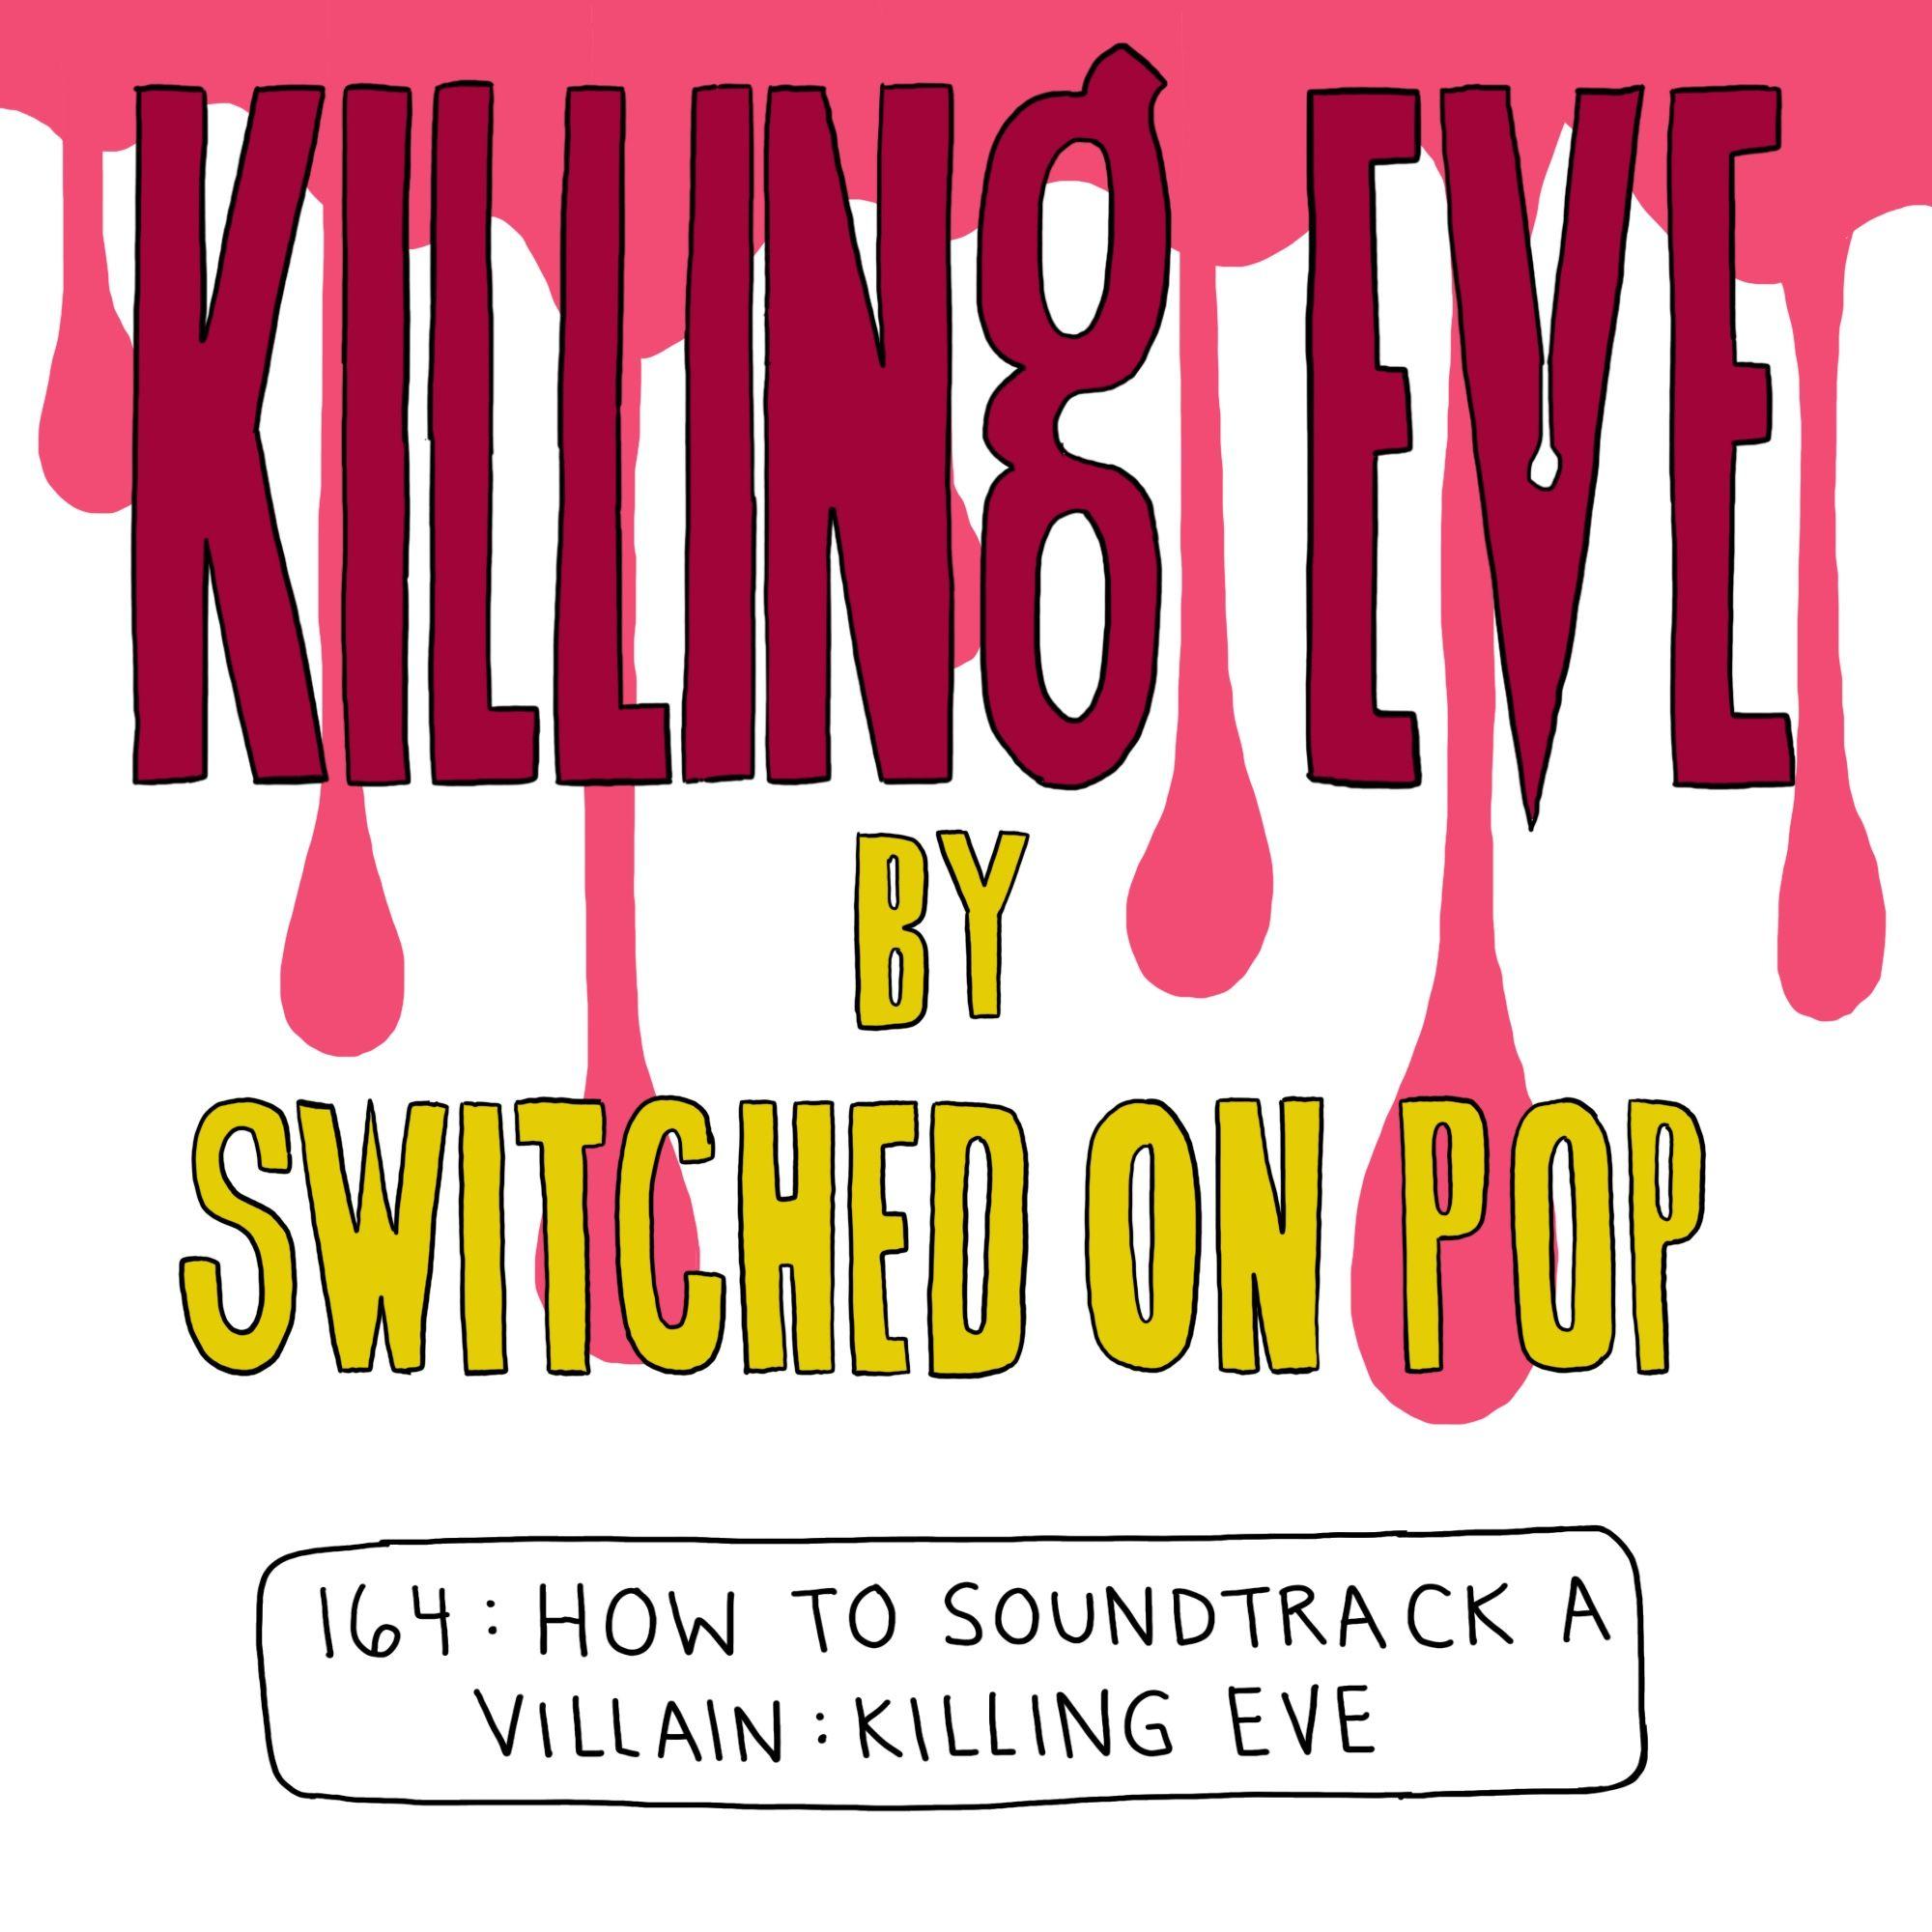 How To Soundtrack A Villain: Killing Eve